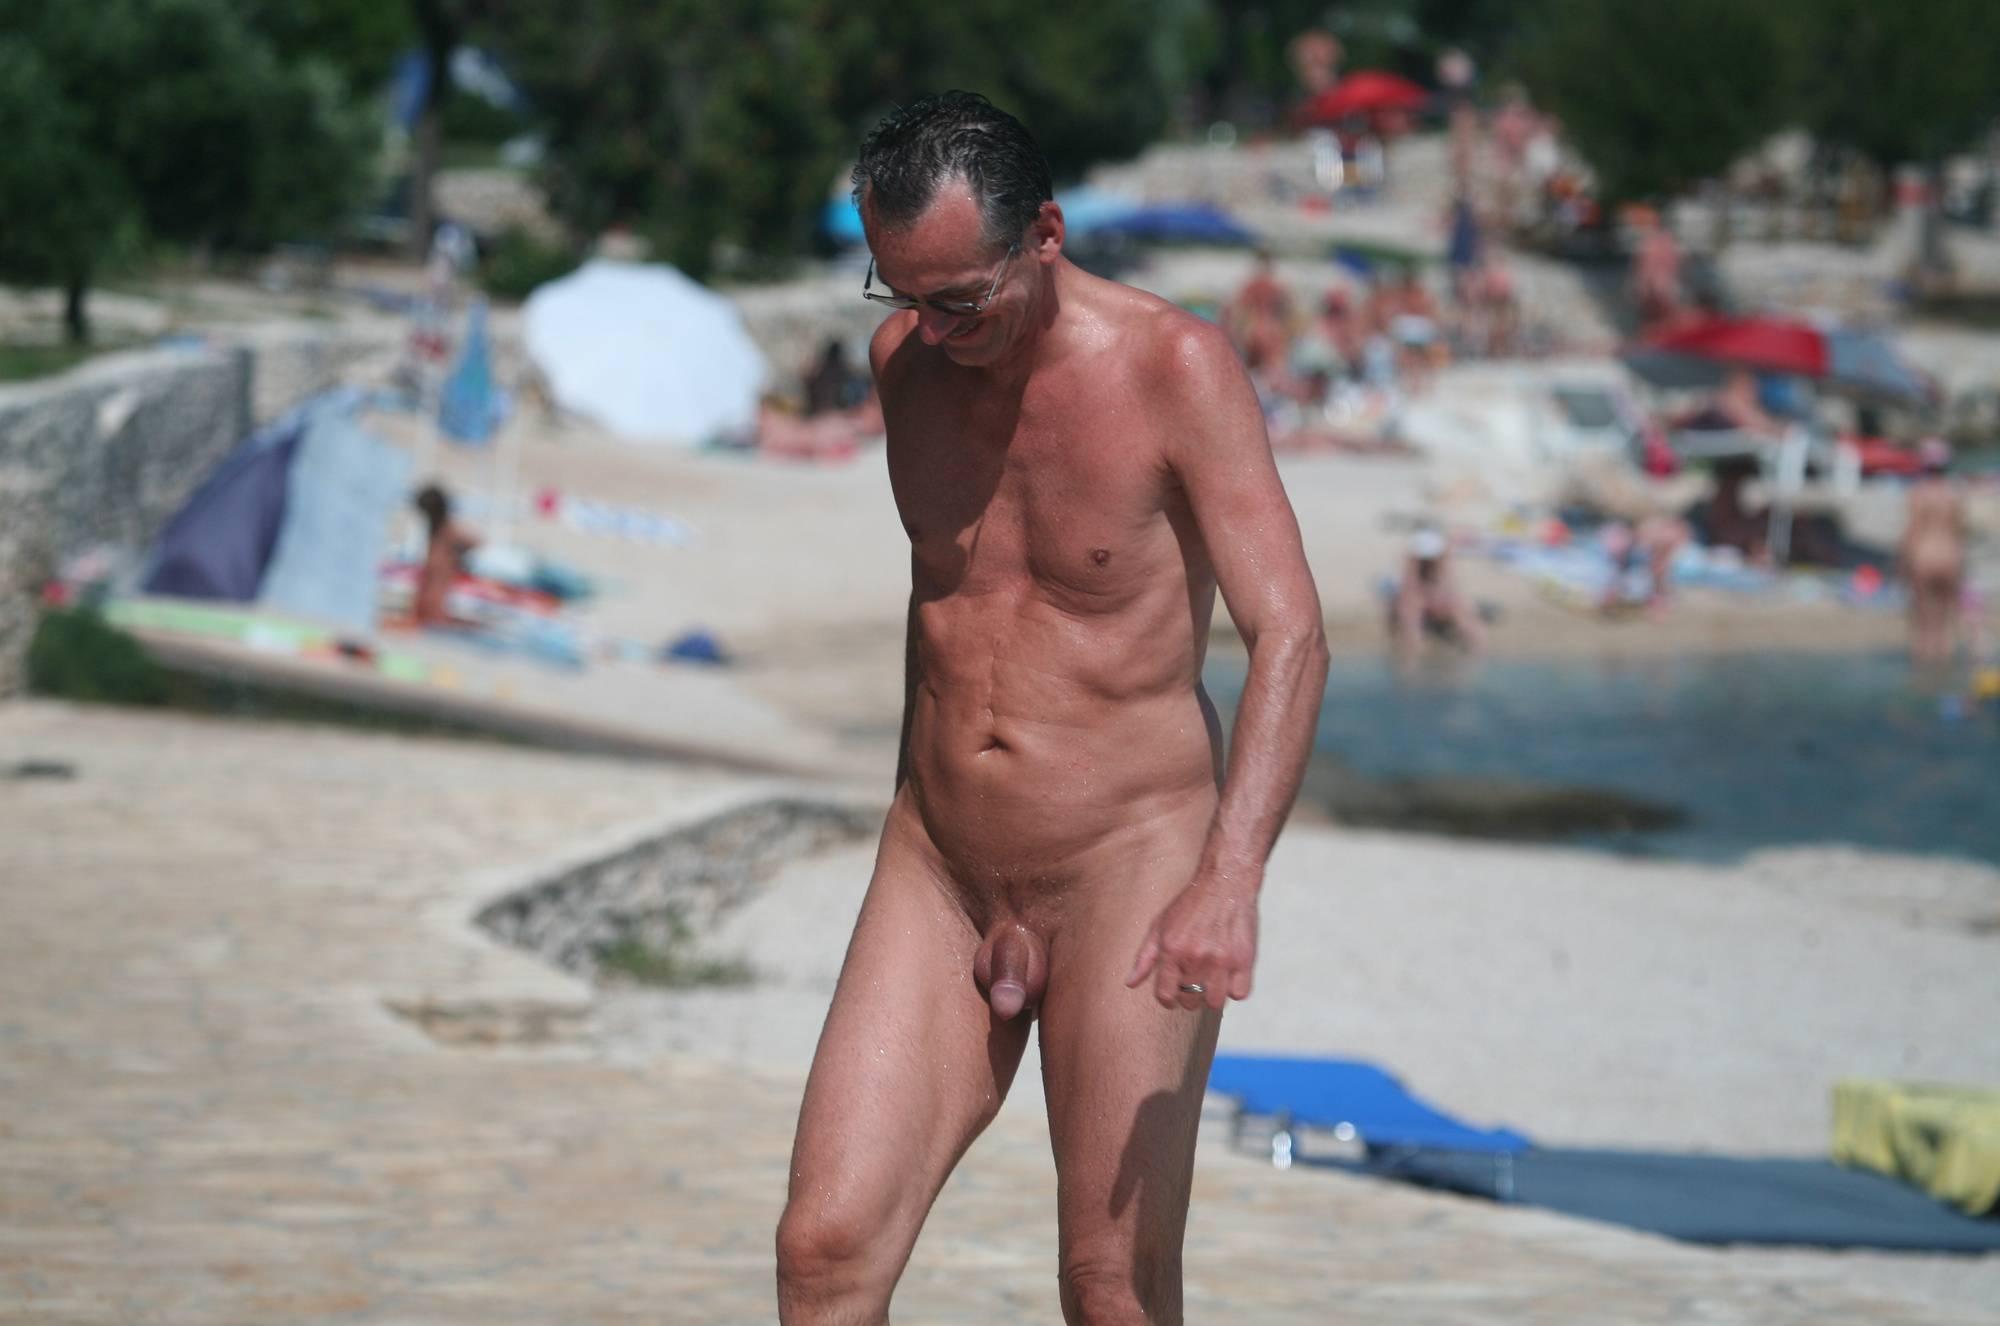 Nudist Pics Nudist Beach Pedestrians - 2